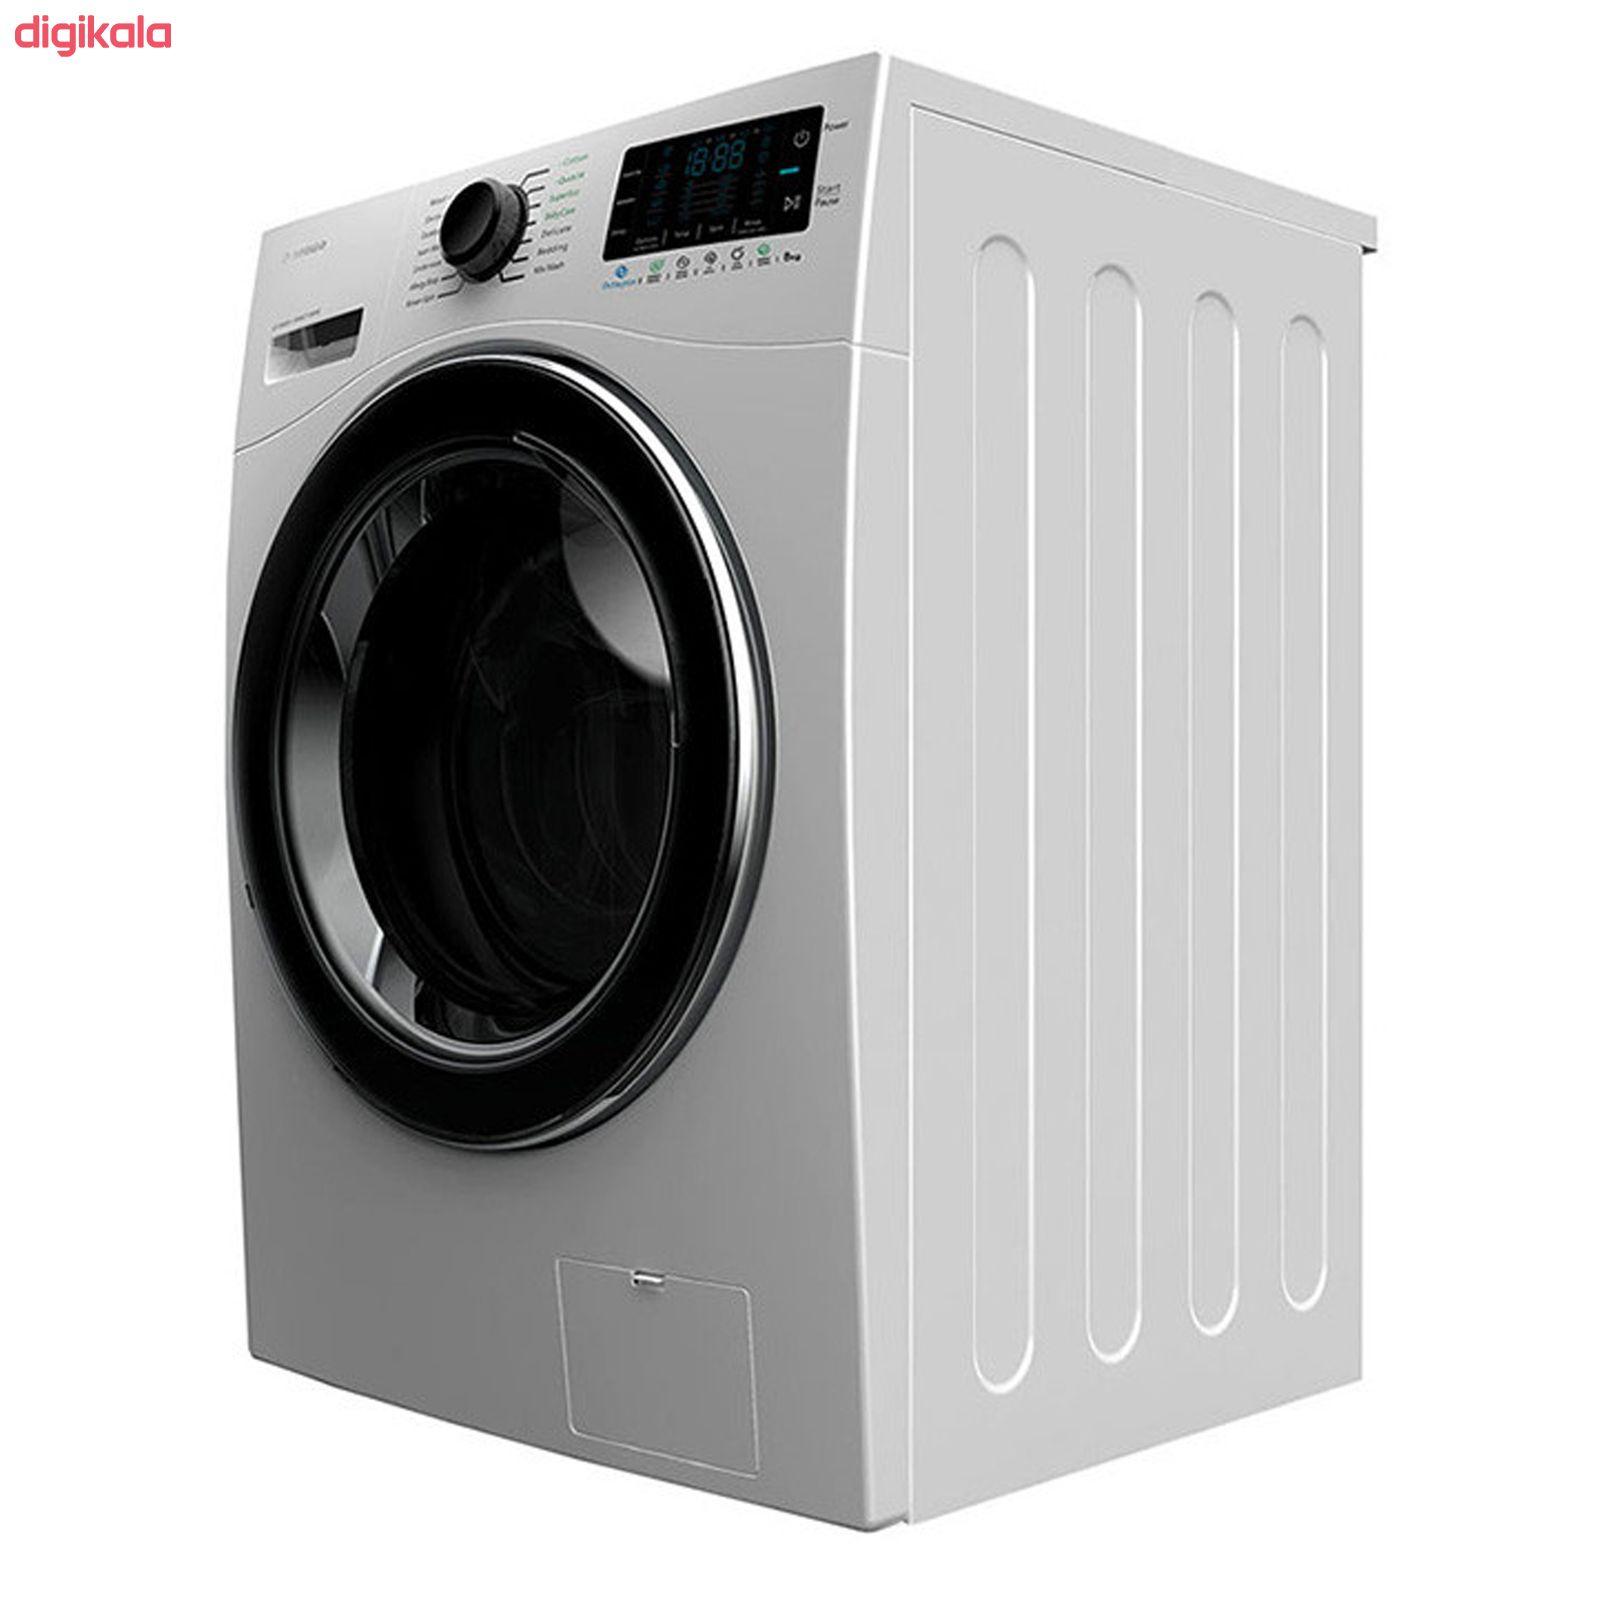 ماشین لباسشویی اسنوا مدل SWM-84516 ظرفیت 8 کیلوگرم main 1 2